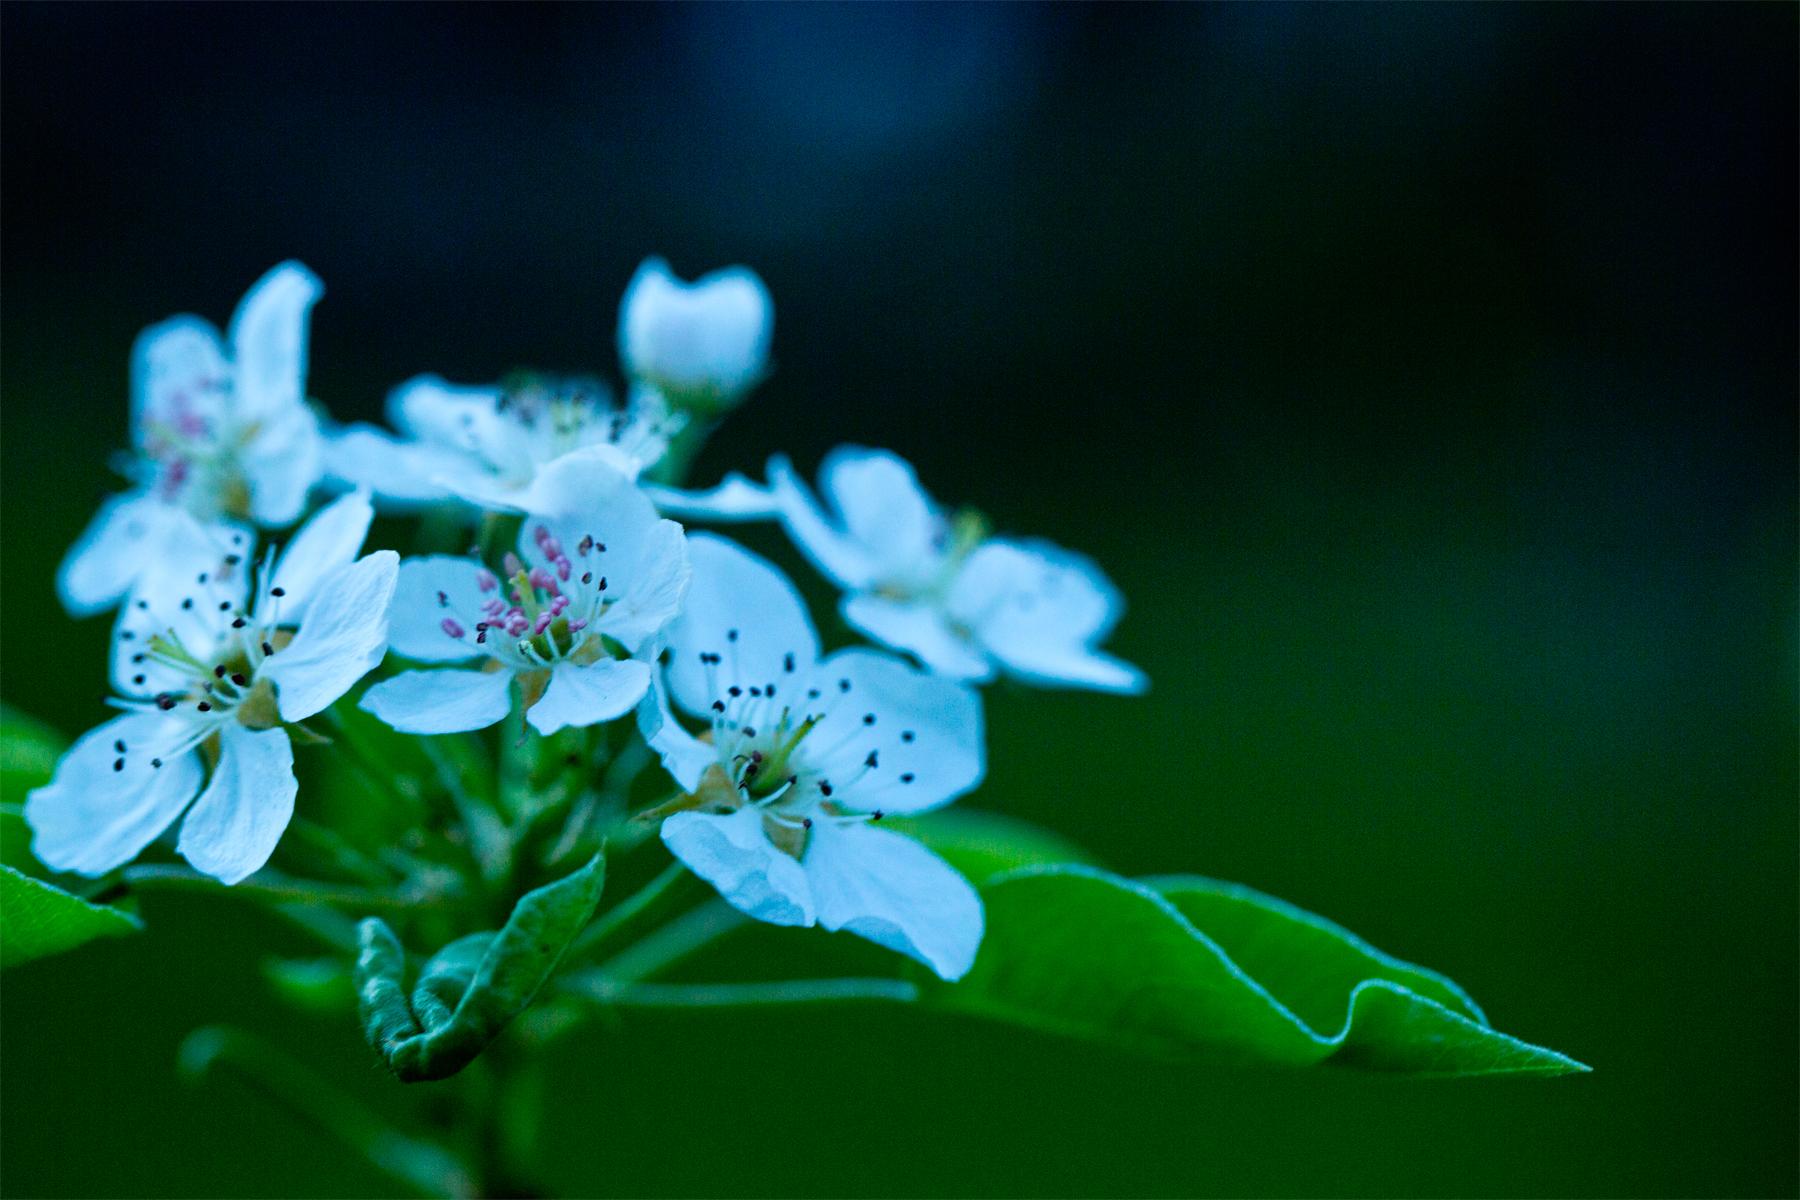 Apfelblüten mit Blatt